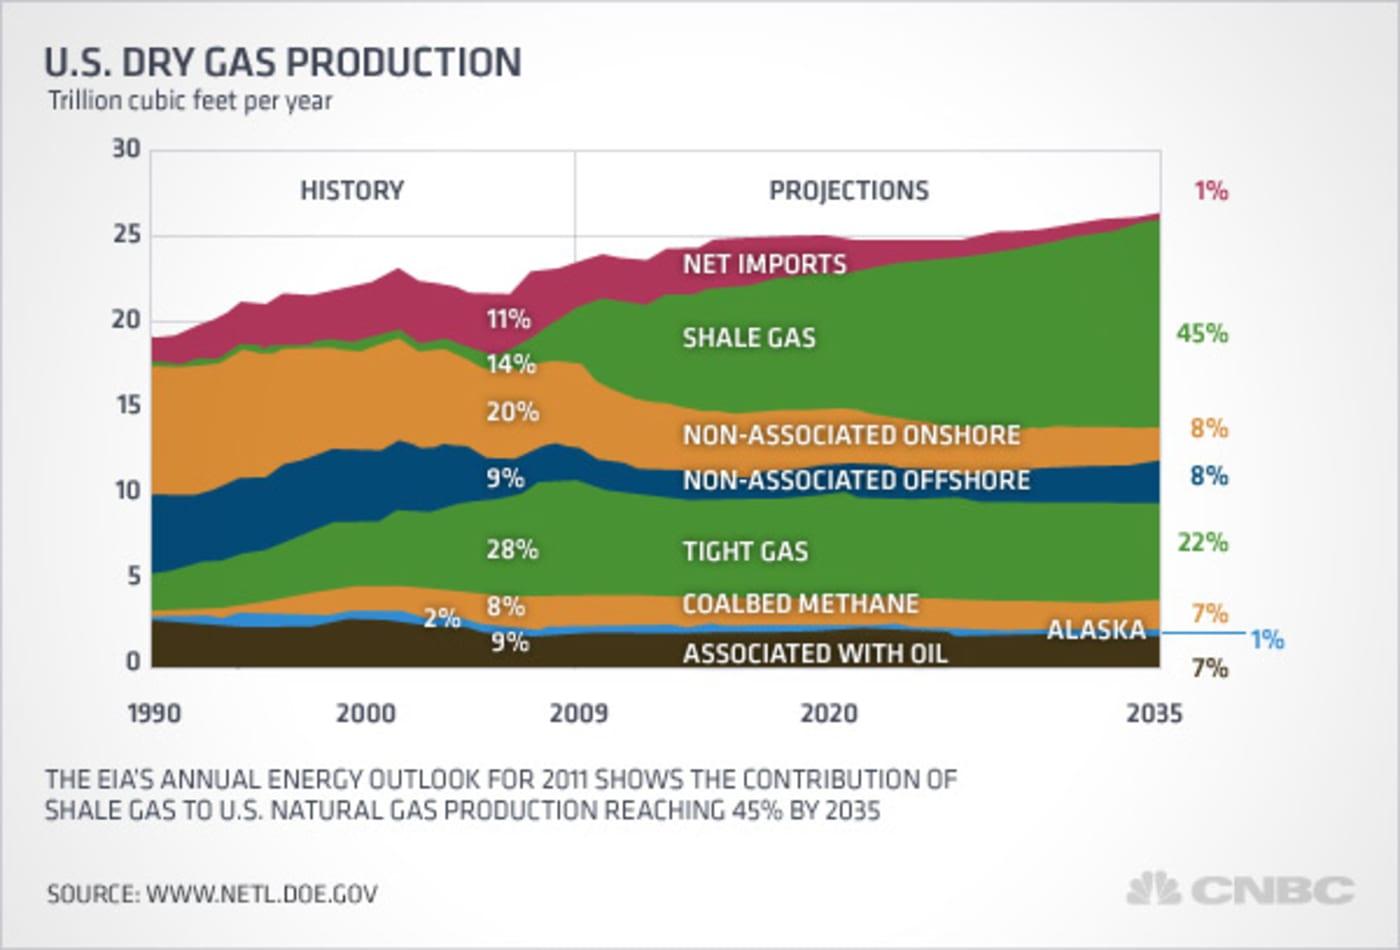 Nat-gas-fracking-US-dry-gas-production.jpg